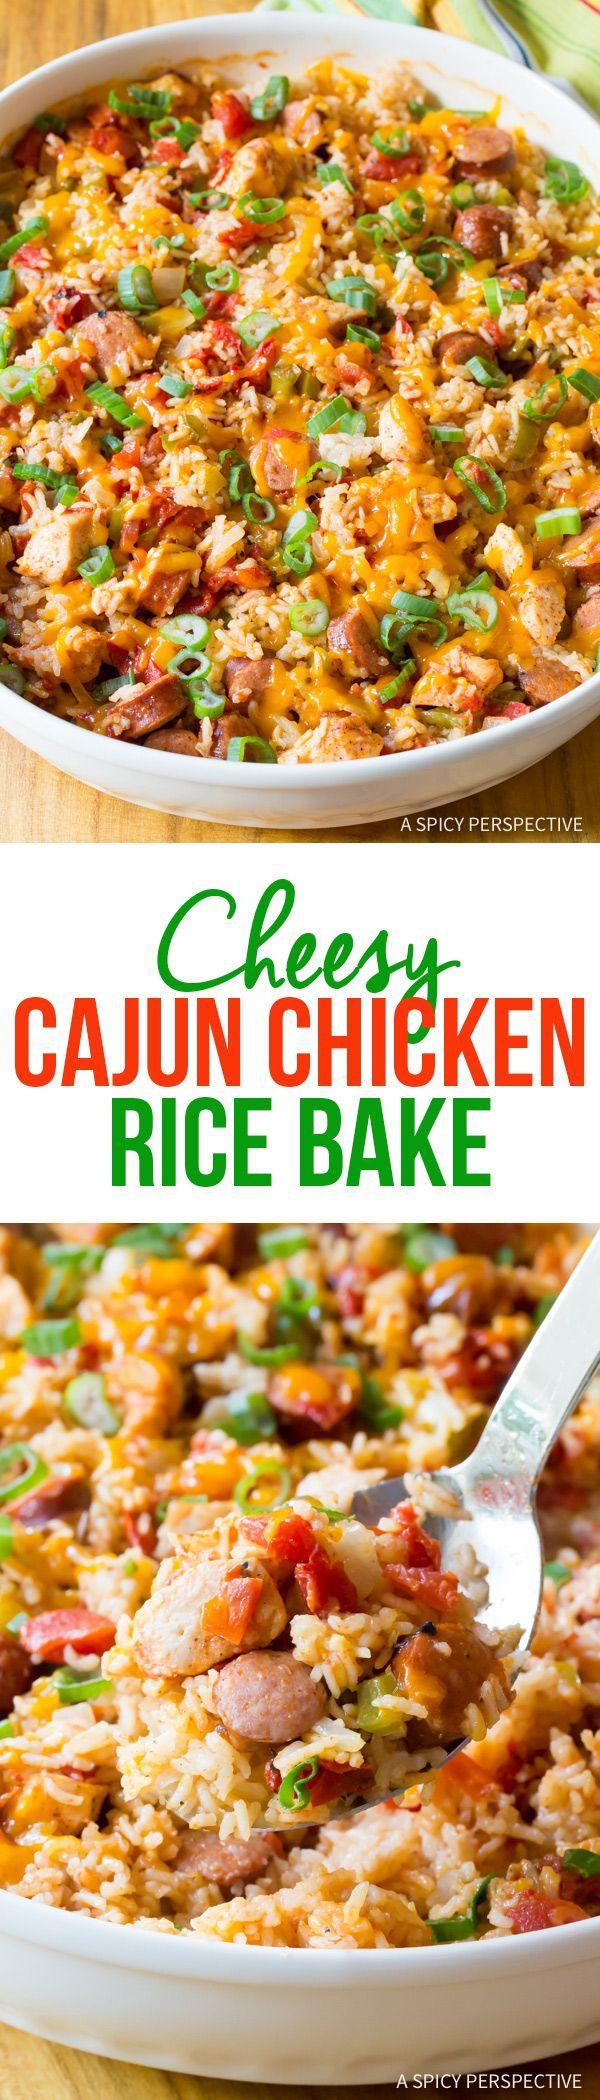 Zesty Cheesy Cajun Chicken and Rice Casserole Recipe #jambalaya